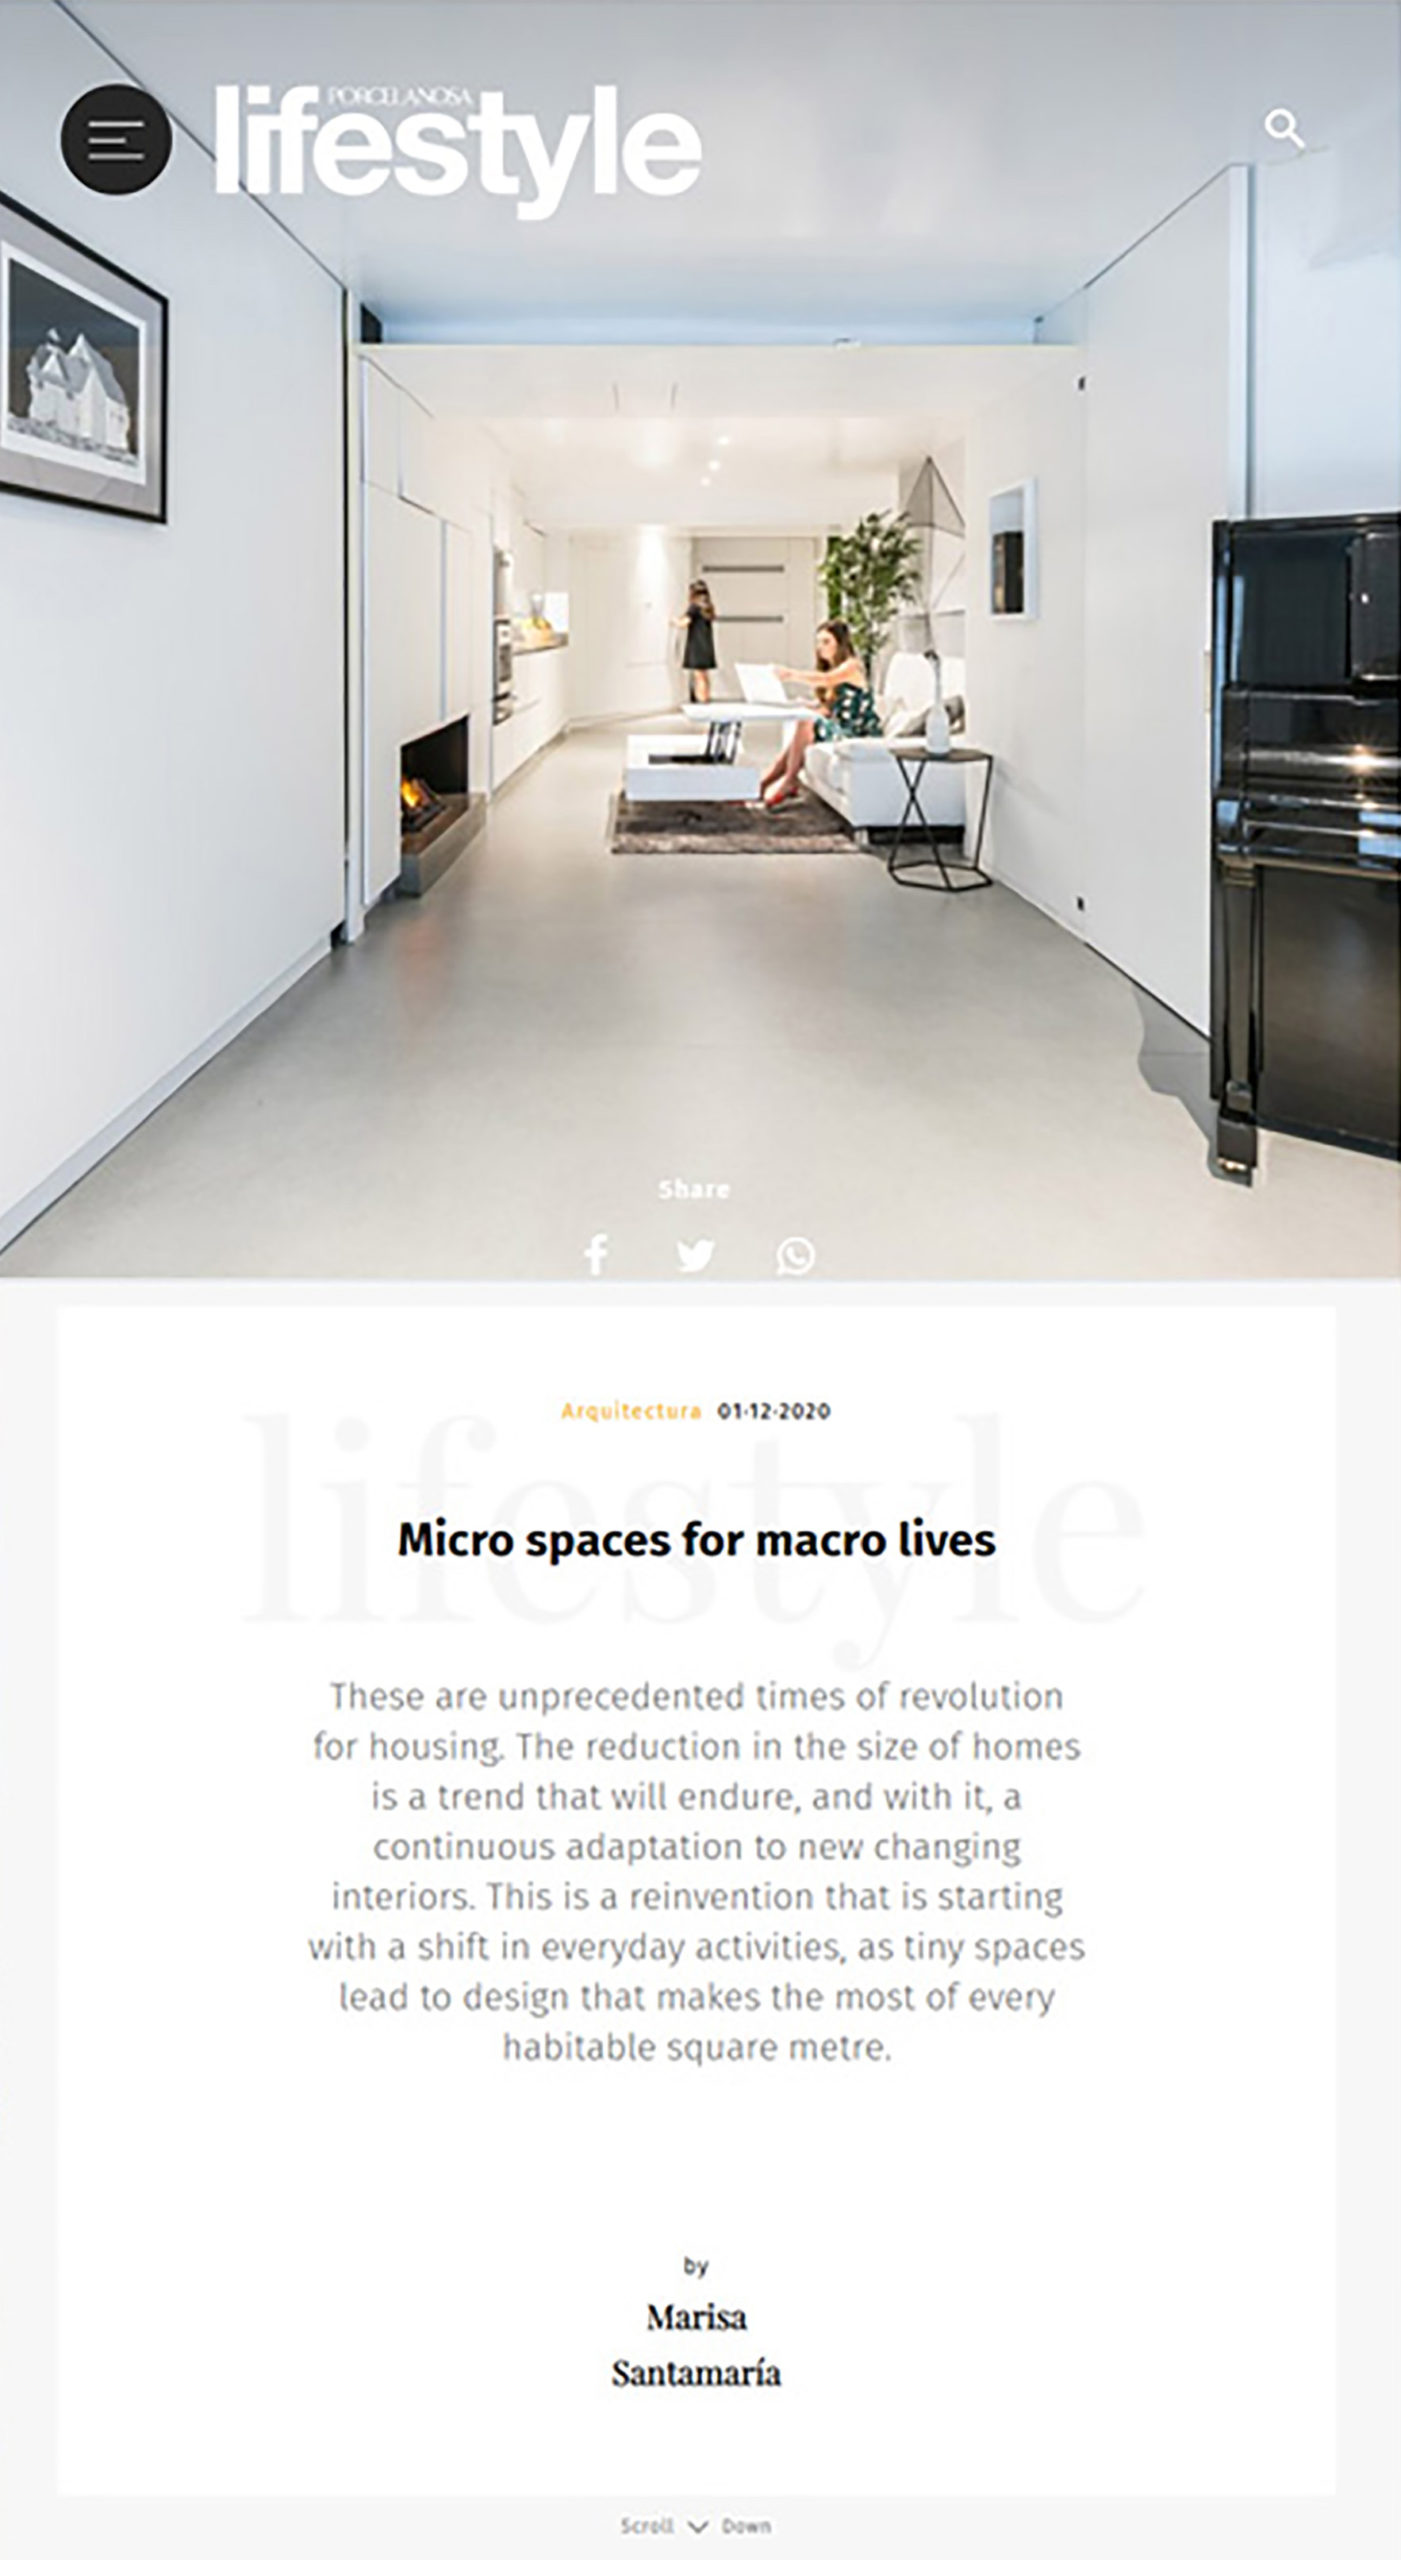 Porcelanosa Lifestyle magazine featured EXD Architecture